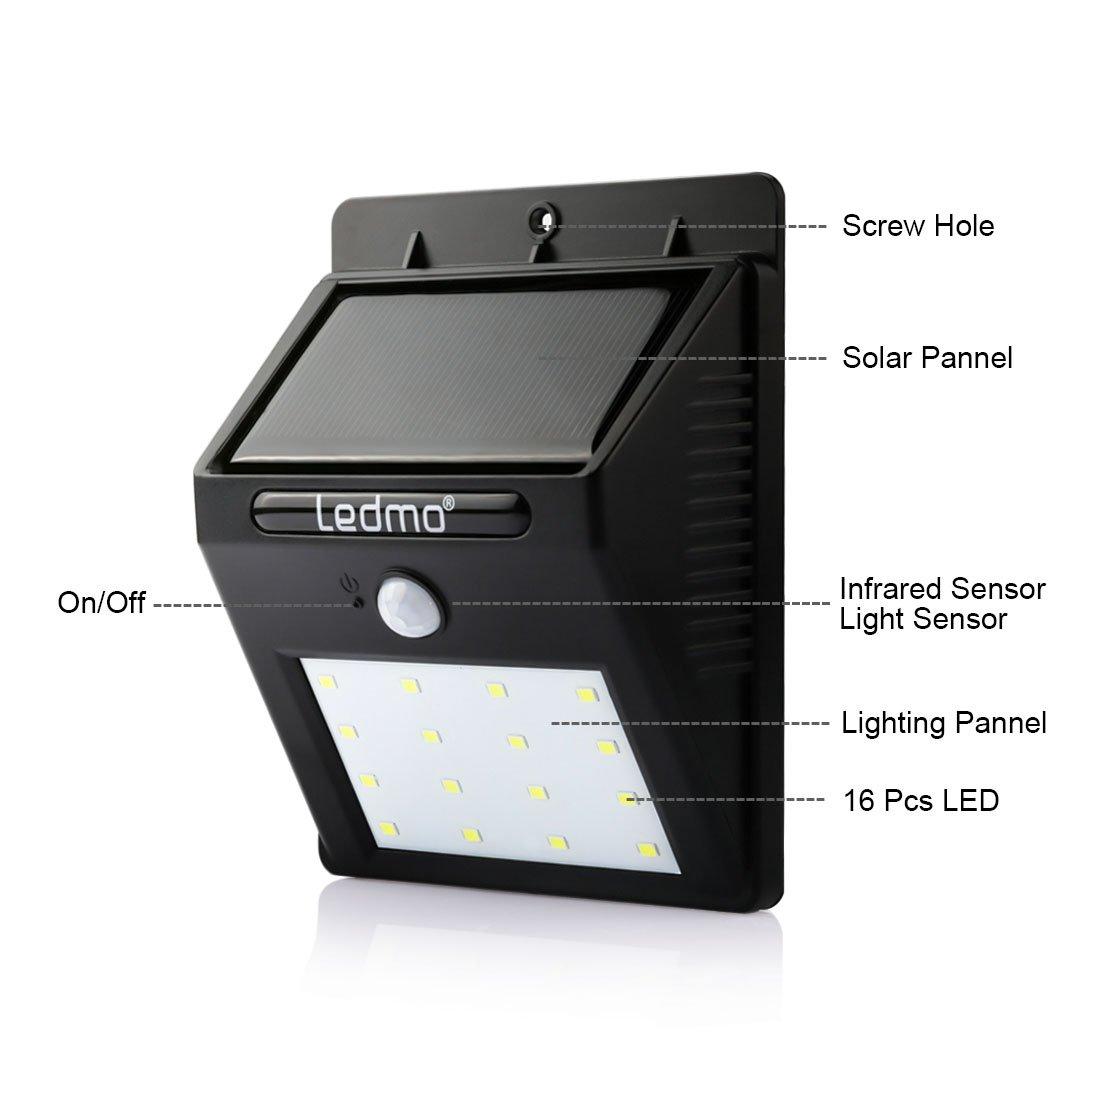 LEDMO 4-Pack Luz Solar LED, 16 LED Lámpara Solar LED, blanco 6000K PIR Sensor de movimiento y sensor ligero impermeable Luz de solar LED con modos ...